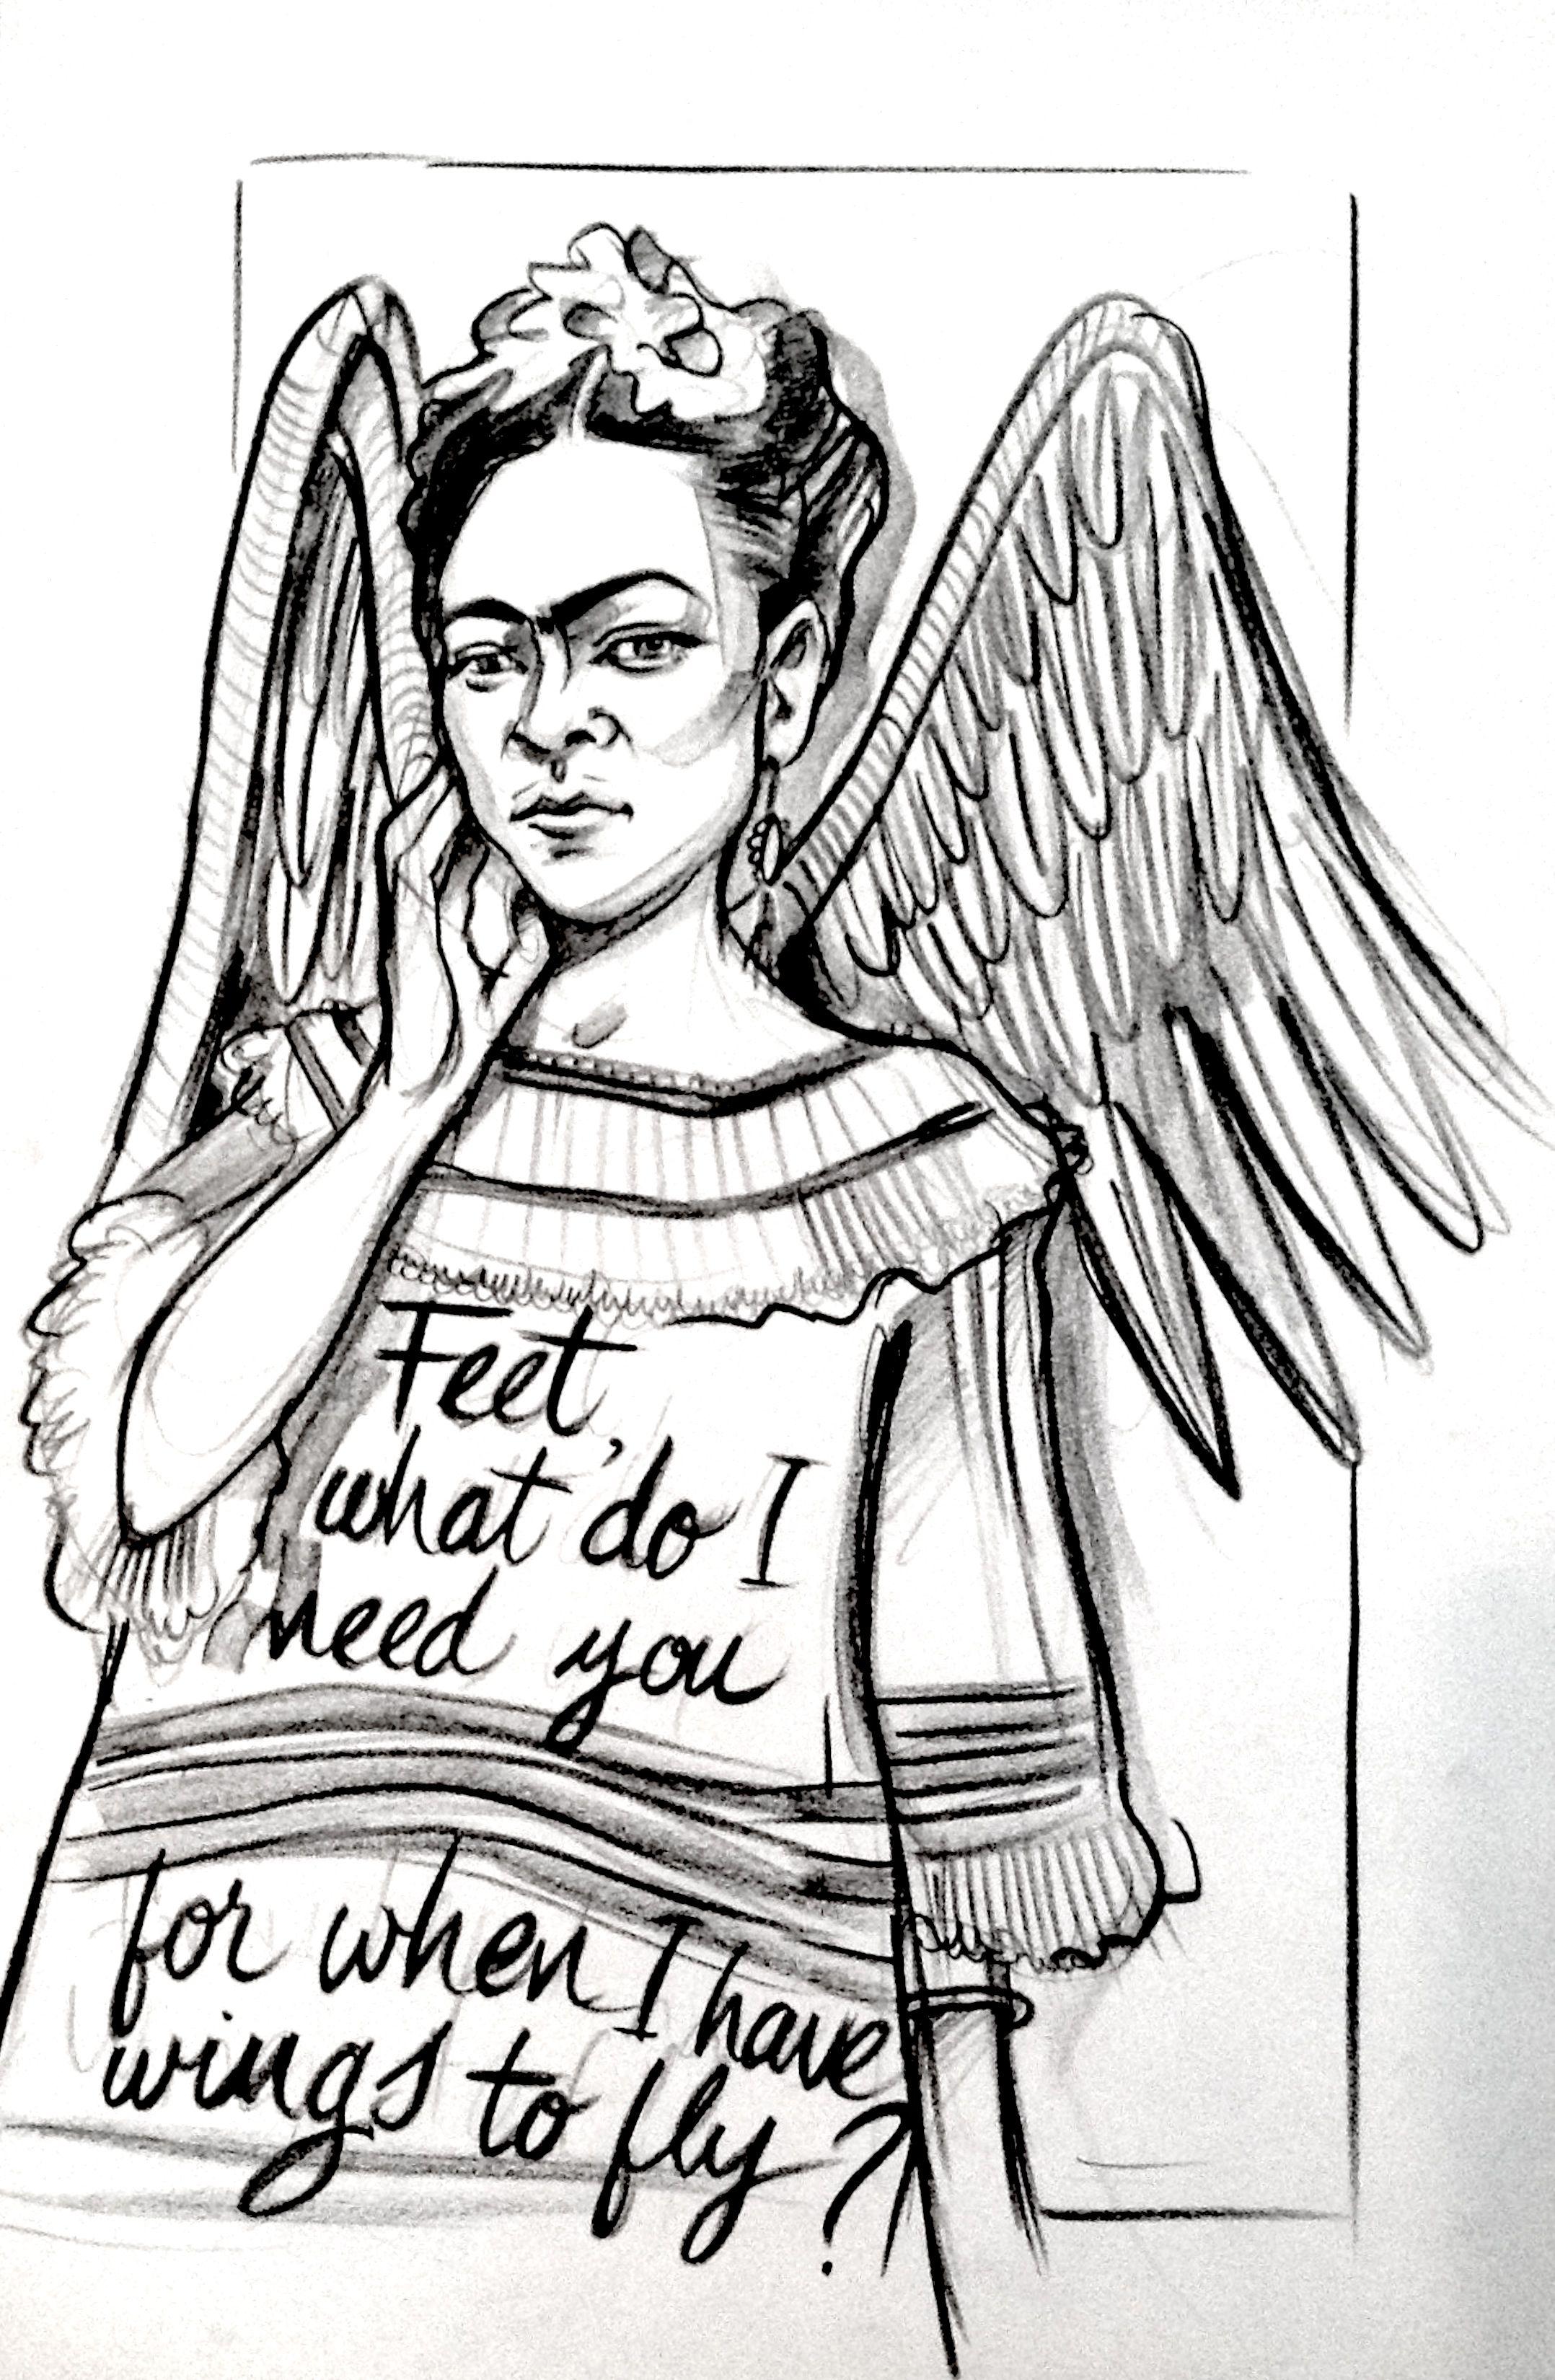 Großzügig Frida Kahlo Malvorlagen Ideen - Malvorlagen Ideen ...